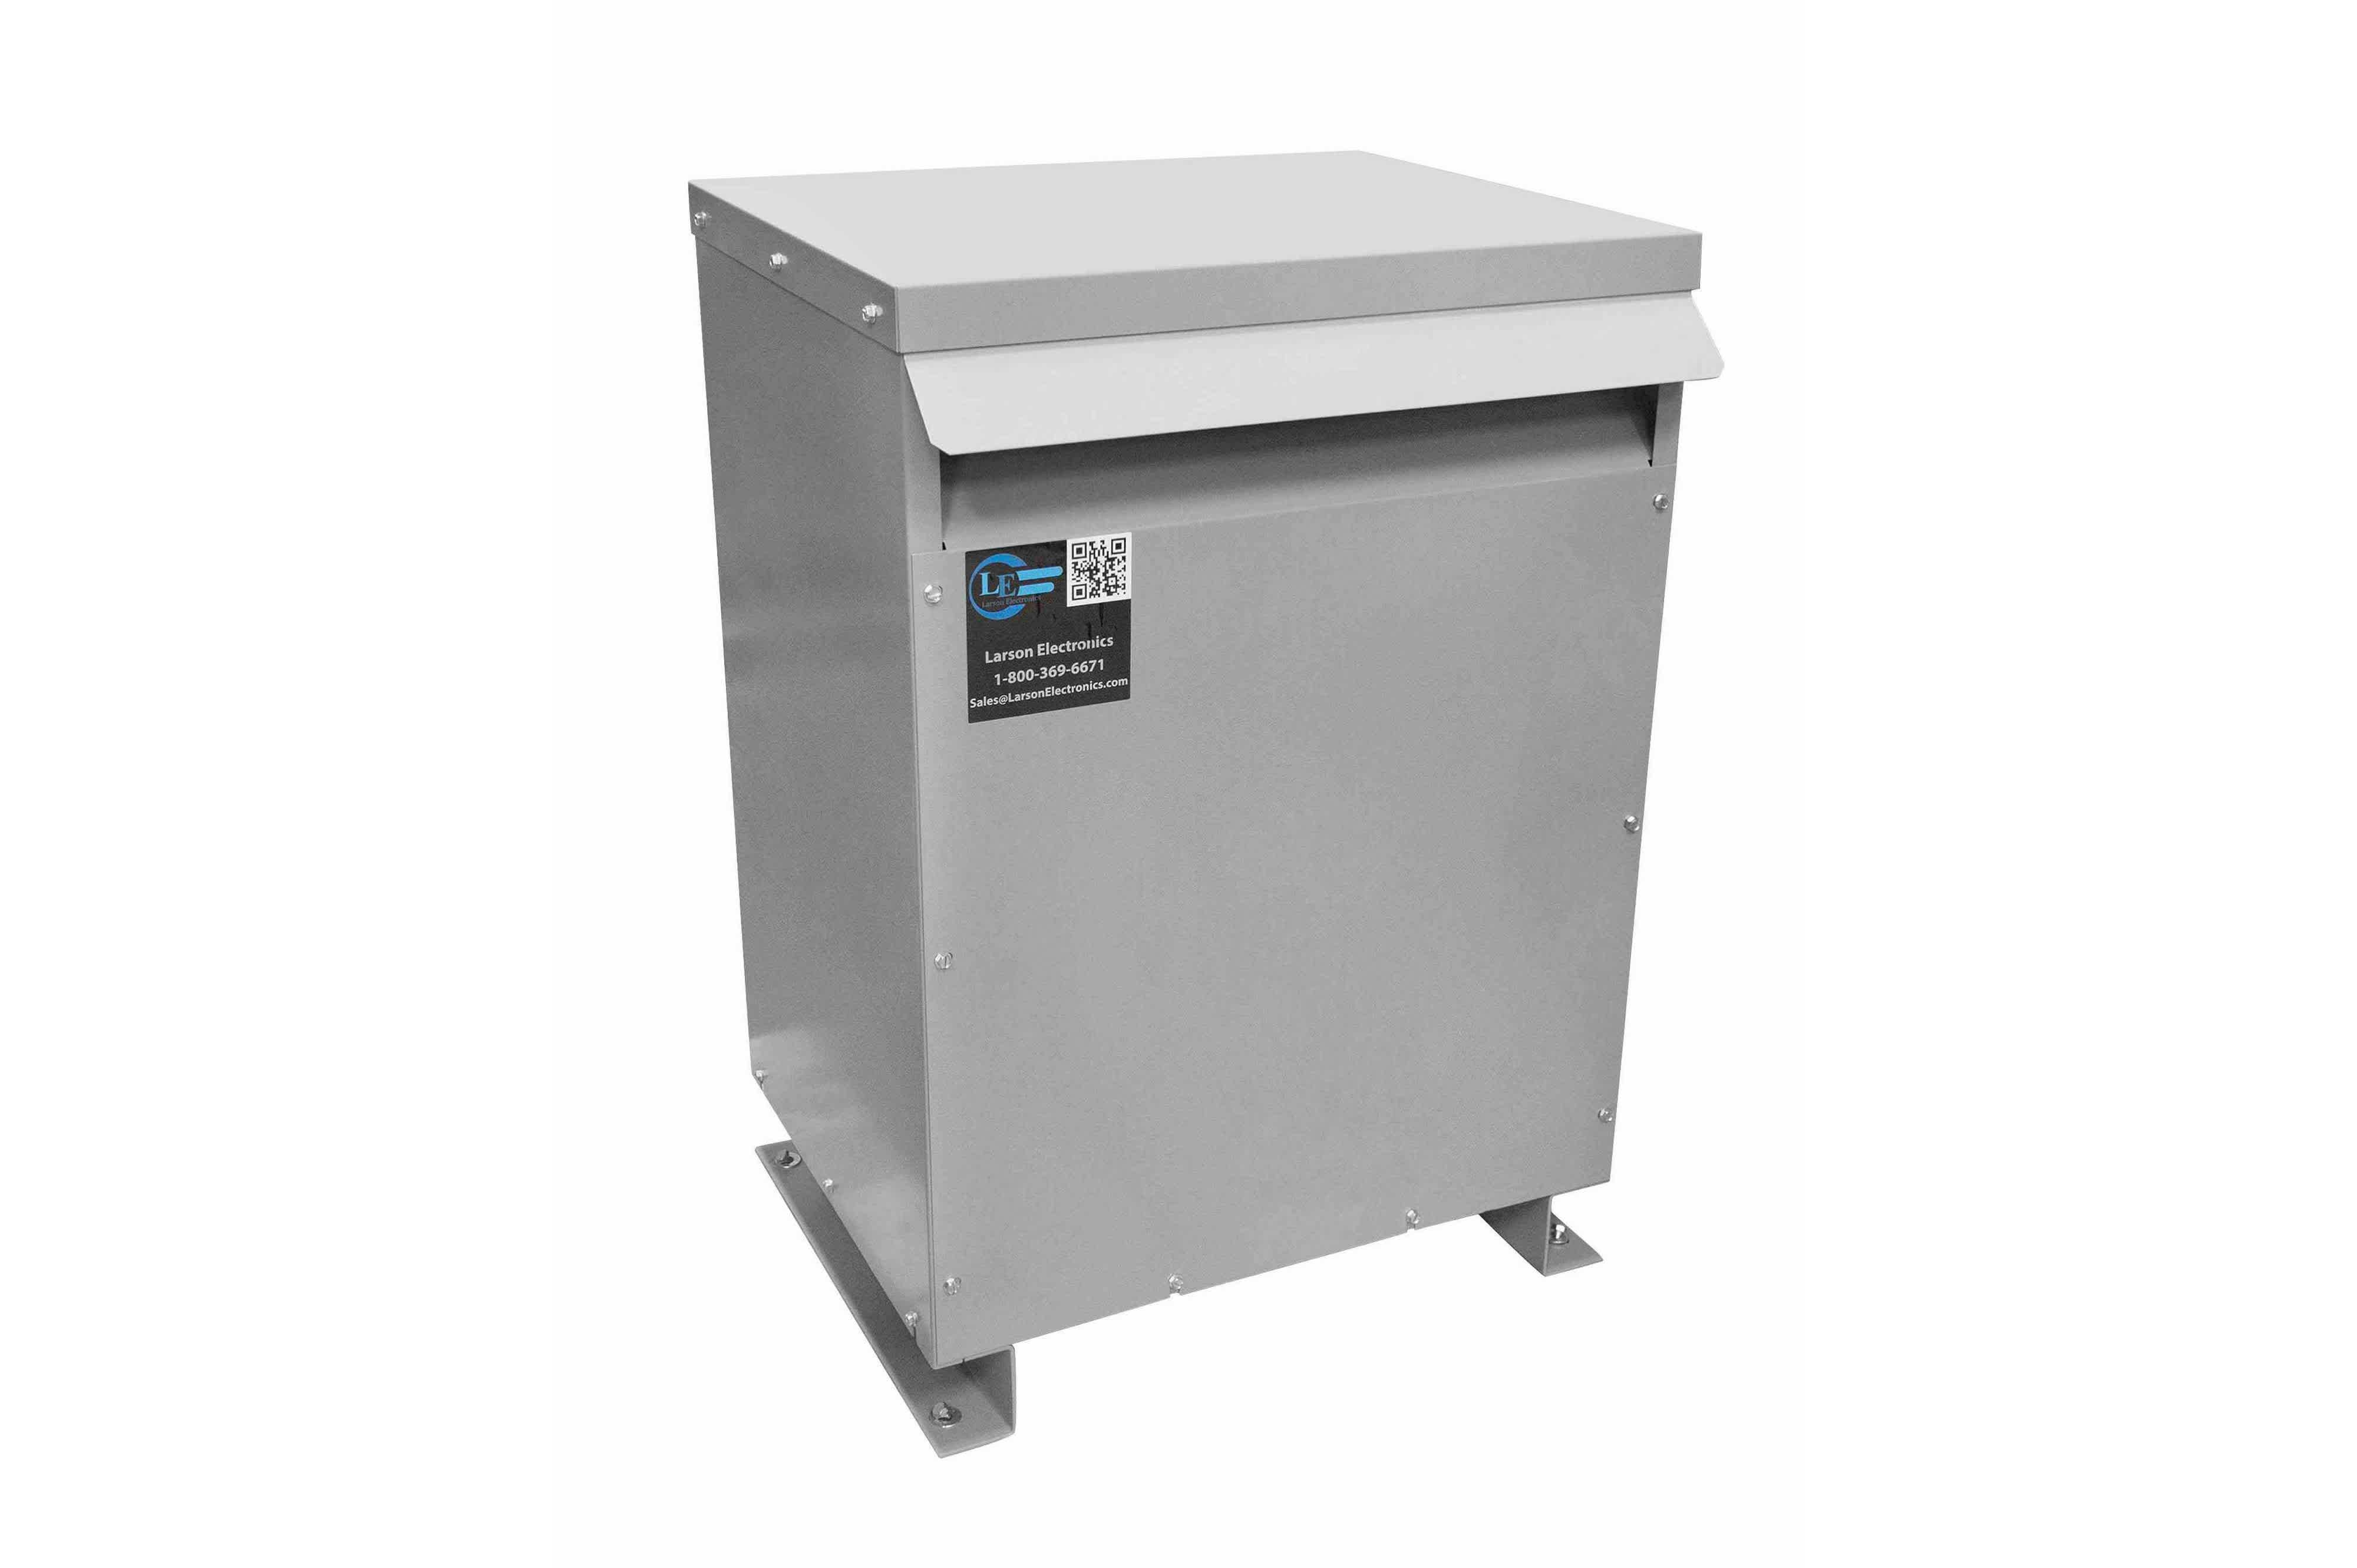 22.5 kVA 3PH Isolation Transformer, 208V Wye Primary, 600Y/347 Wye-N Secondary, N3R, Ventilated, 60 Hz